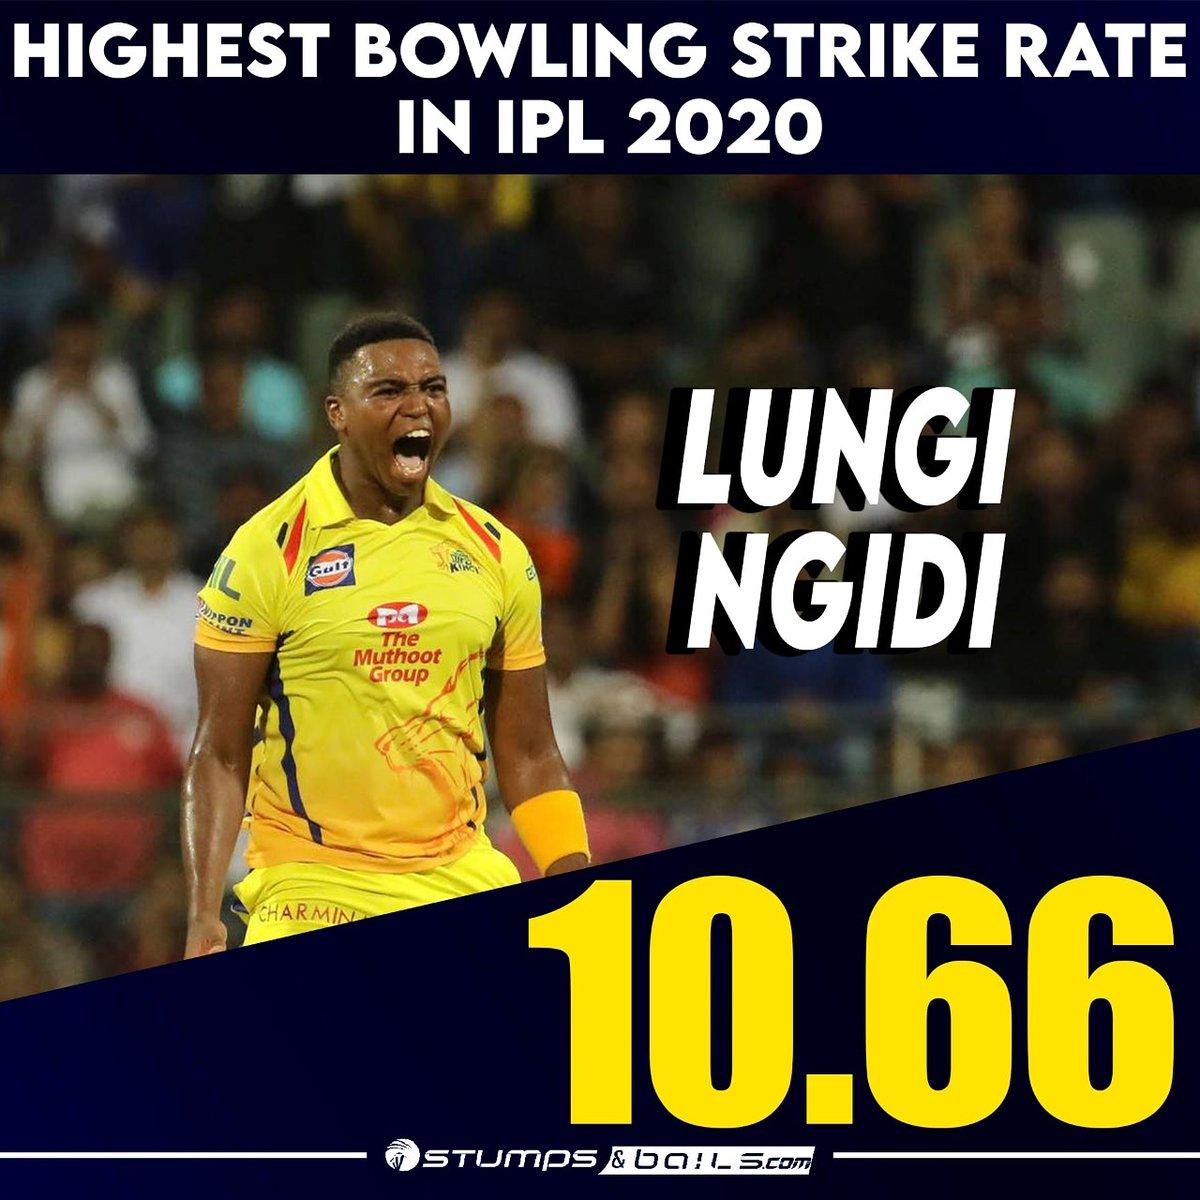 Highest bowling SR in #IPL2020 🤩🥳 #LungiNgidi  Follow us @stumpnbails #IPL2020finals #IPLinUAE #IPLFinals #Dream11IPL2020 #MI #DC #MIvsDC #DCvMI #MumbaiIndians #DelhiCapitals #RohitSharma #CSK #ChennaiSuperKings